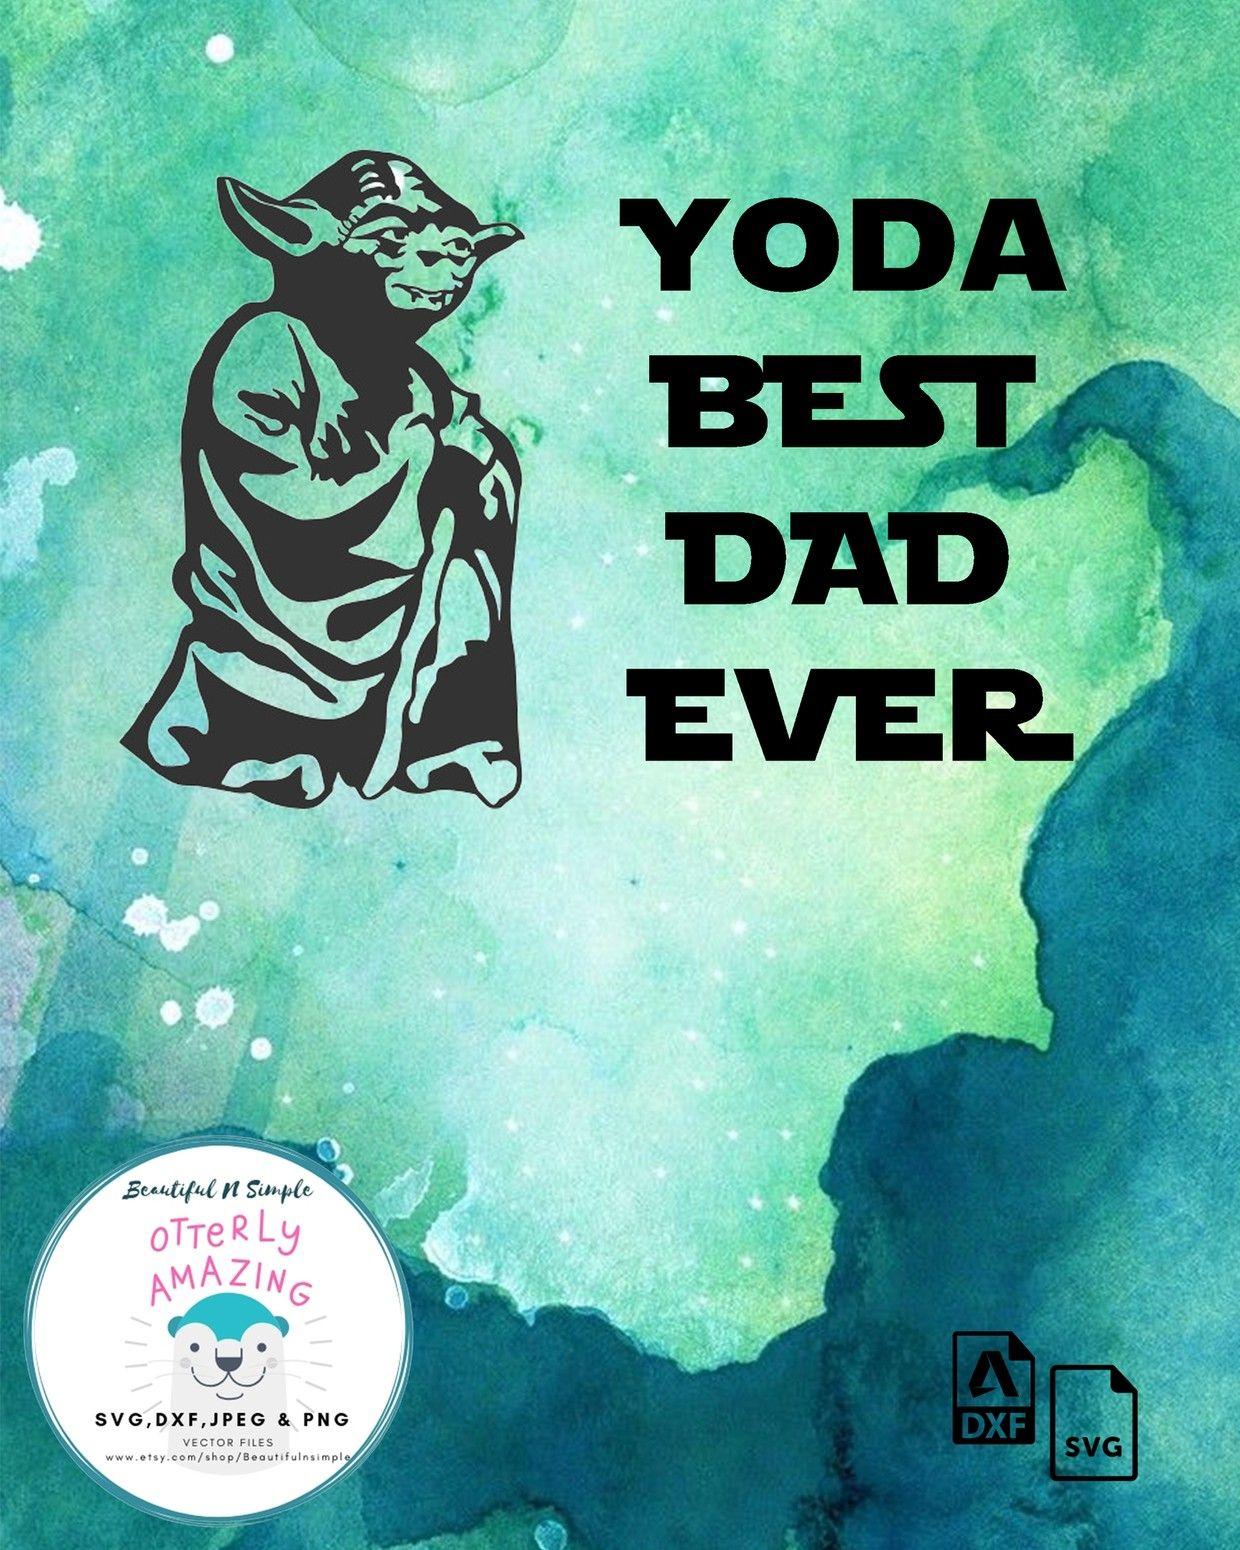 Yoda Best Dad Ever Star Wars Inspired SVG DXF File Best